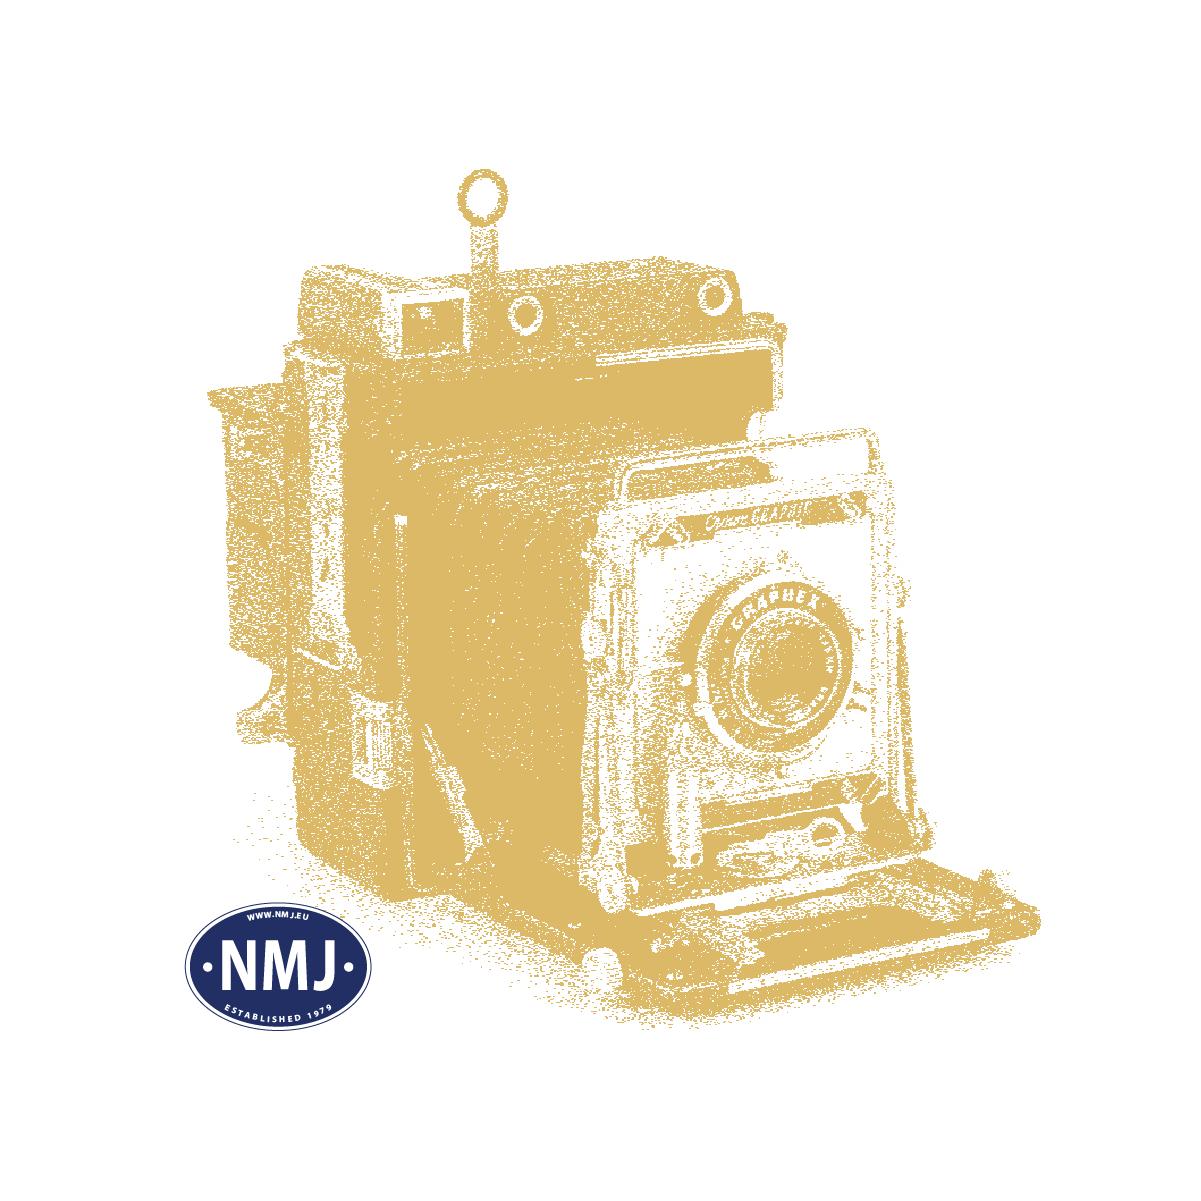 NMJT145003 - NMJ Topline NSB Di3.623, Gammeldesign, 0-Skala